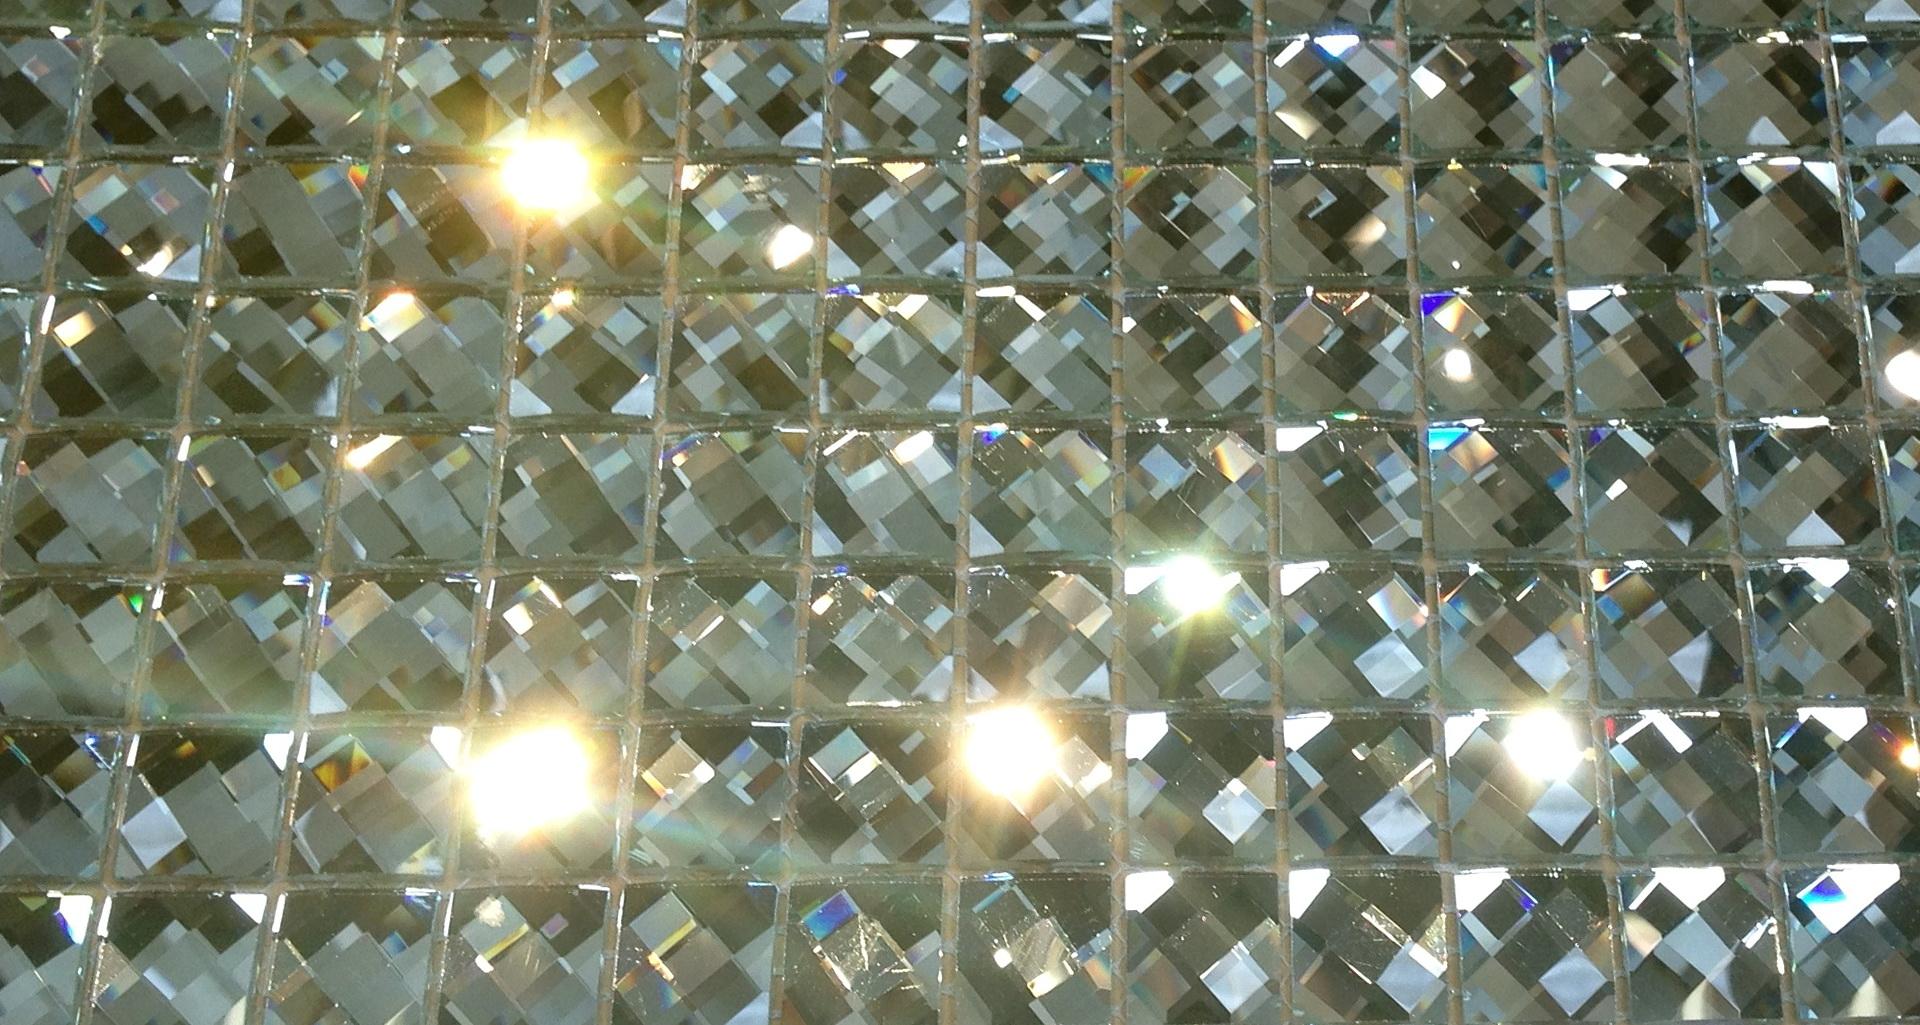 Mirror Mosaic Tiles On Mesh